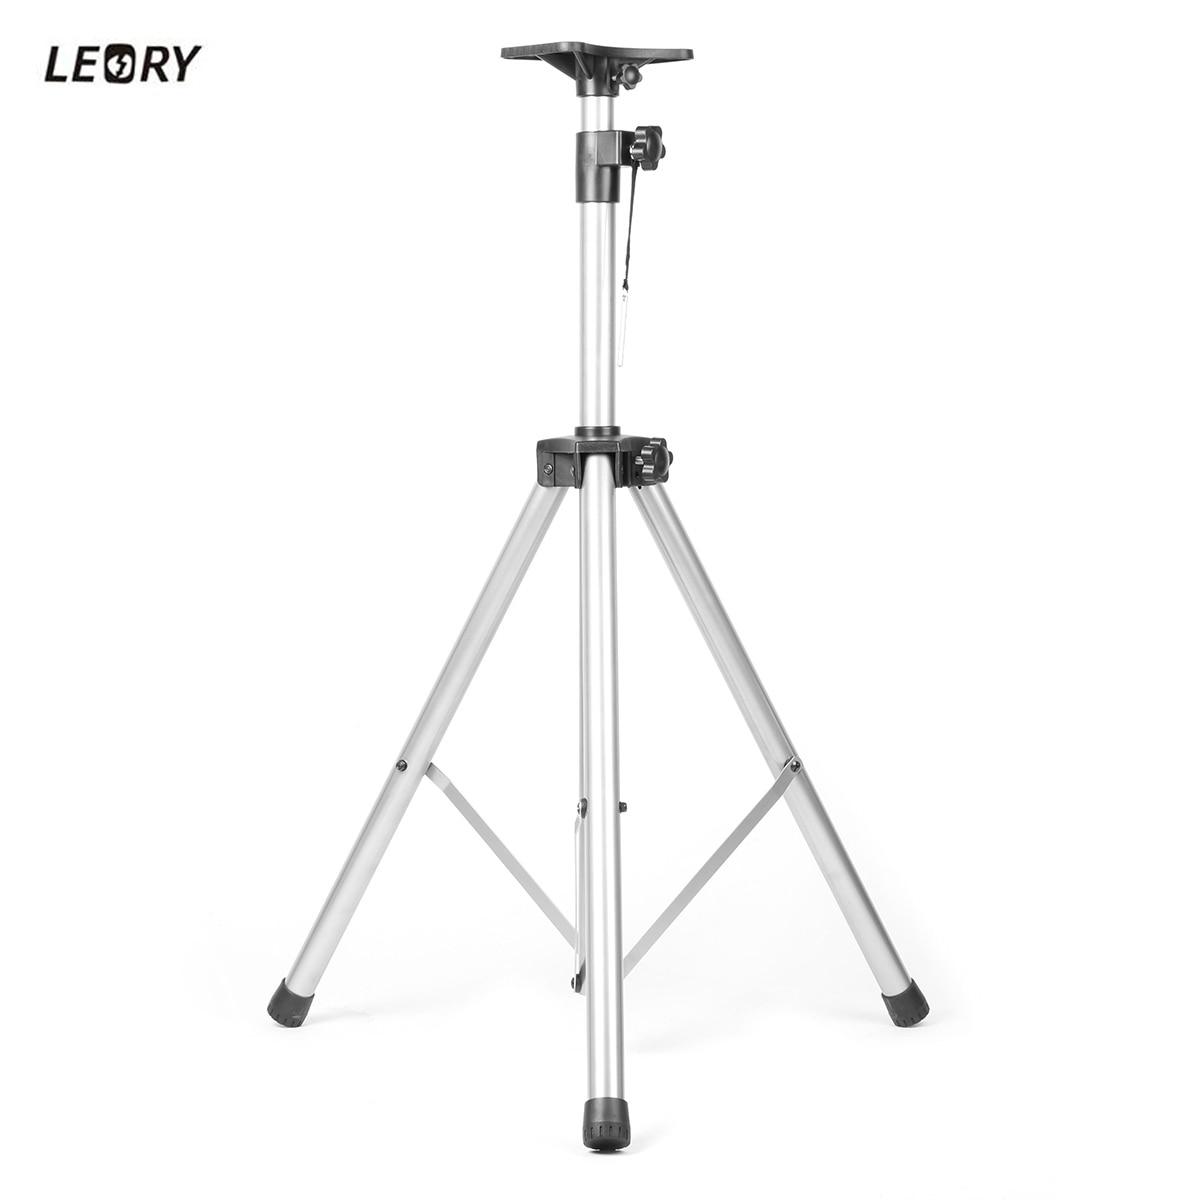 где купить LEORY 80kg Load Bearing Professional KTV Speaker Stand Mounting Bracket Loudspeaker Speaker Stand Holder Set по лучшей цене